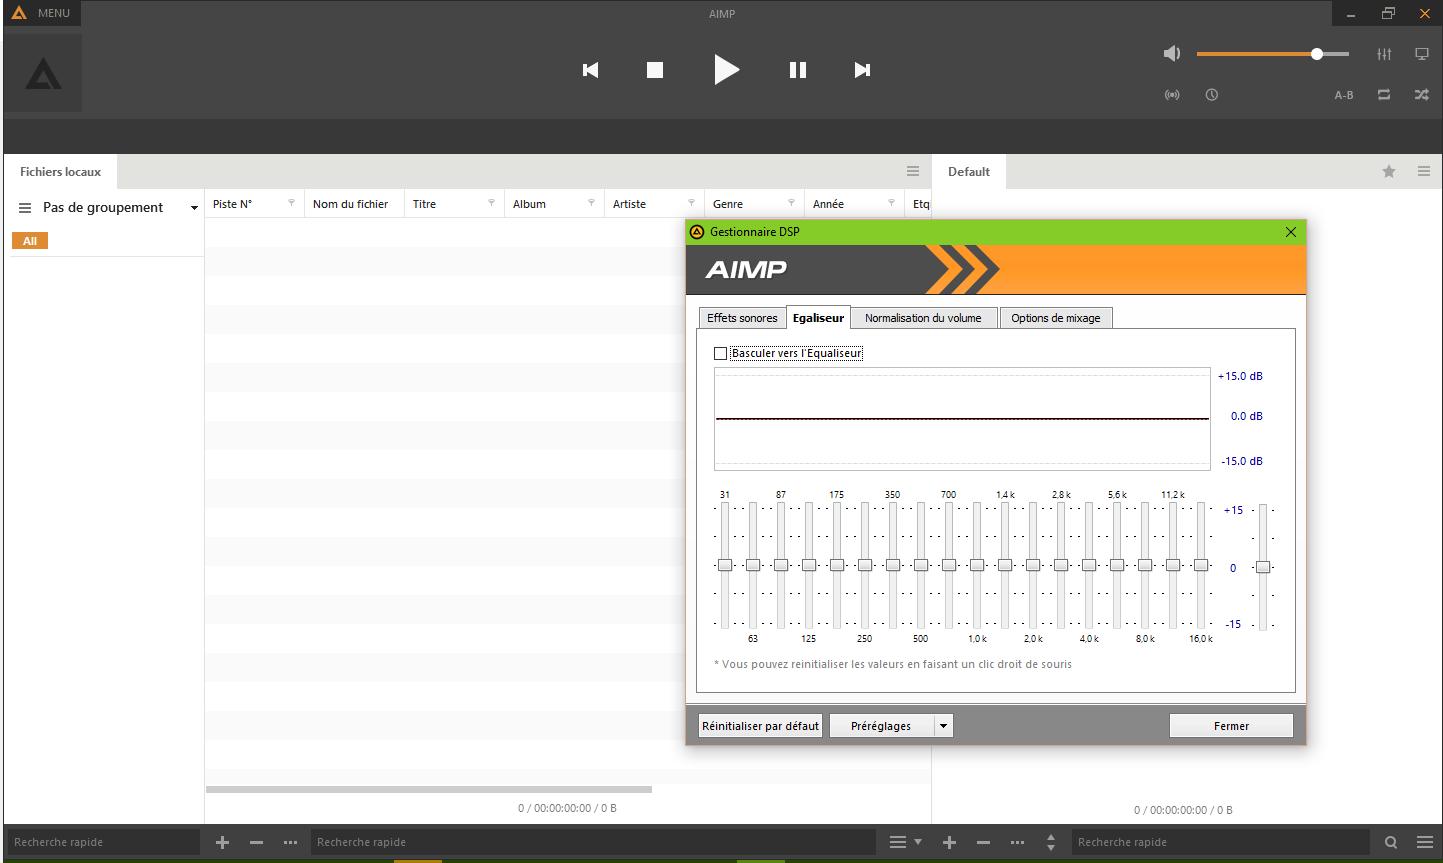 Capture d'écran AIMP